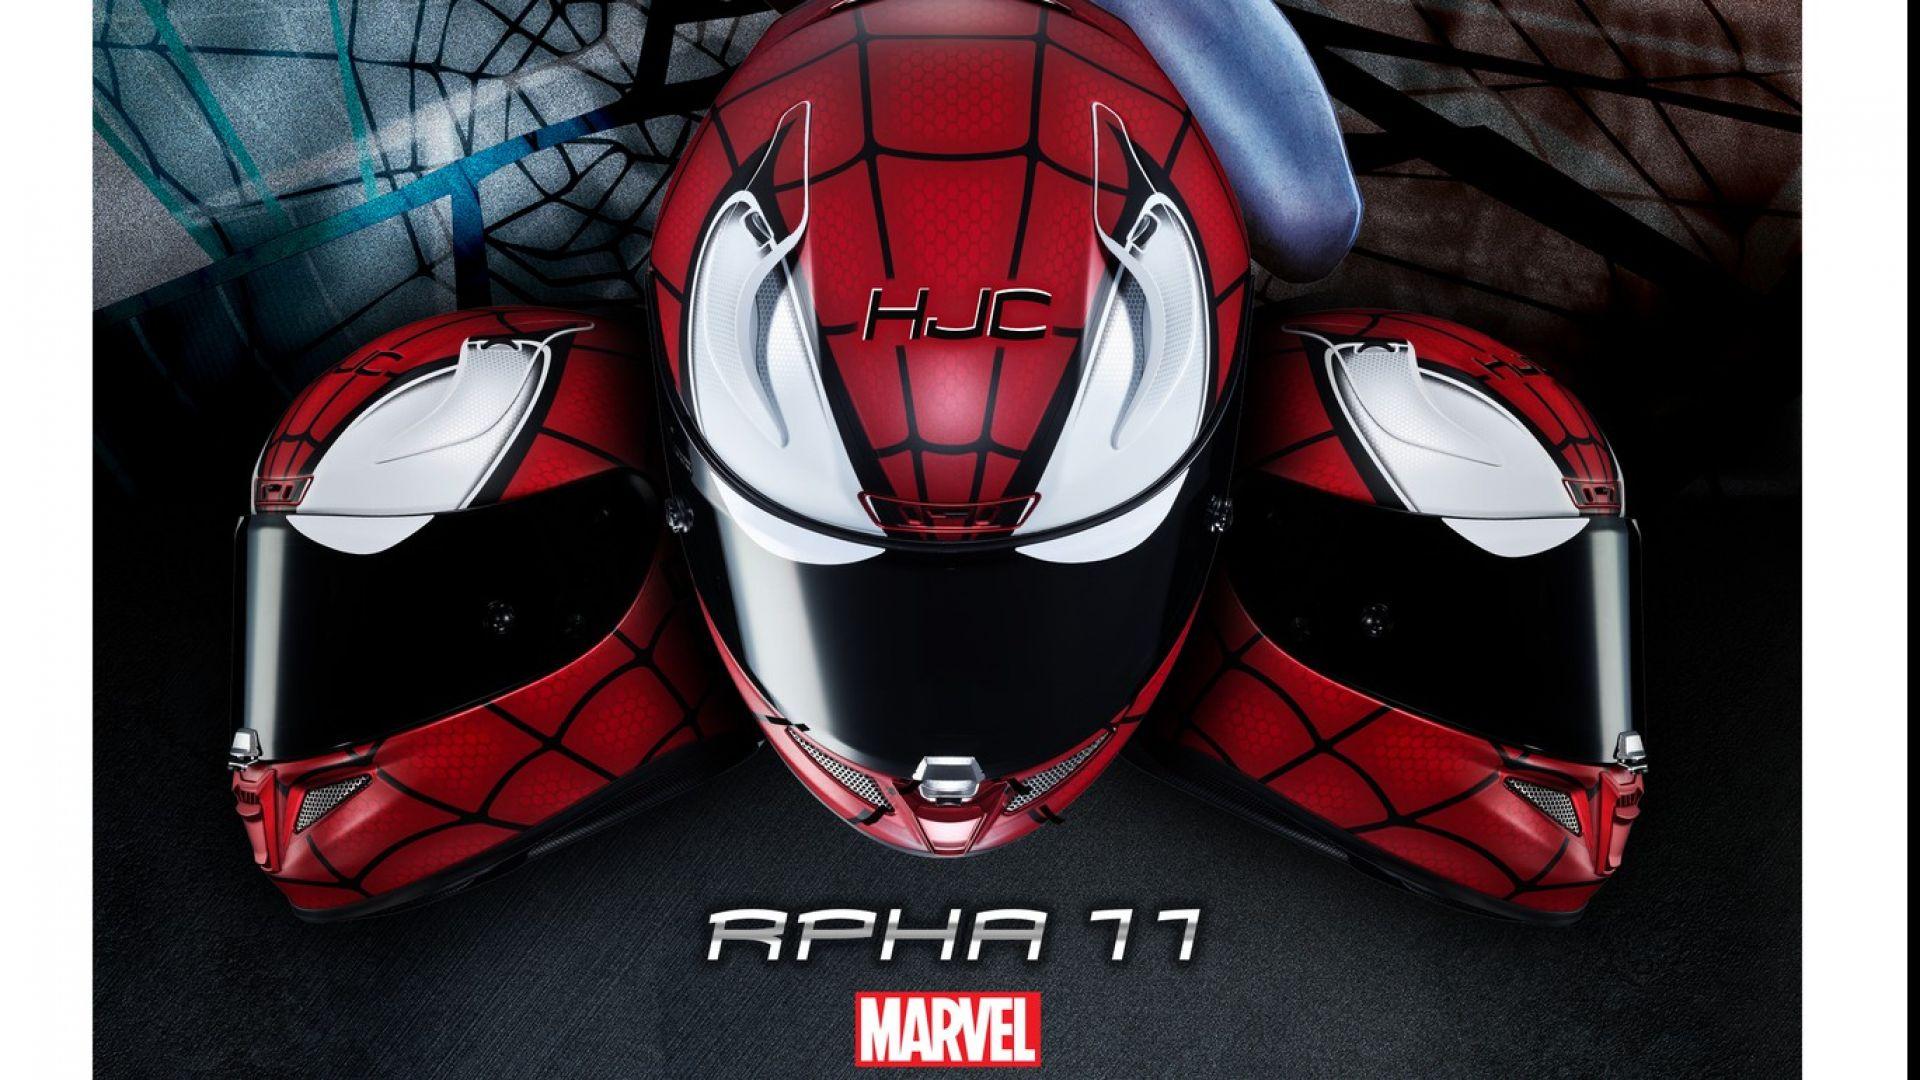 Hjc Rpha 11 >> Caschi da supereroi: HJC e Marvel: i nuovi caschi ispirati ai fumetti - MotorBox